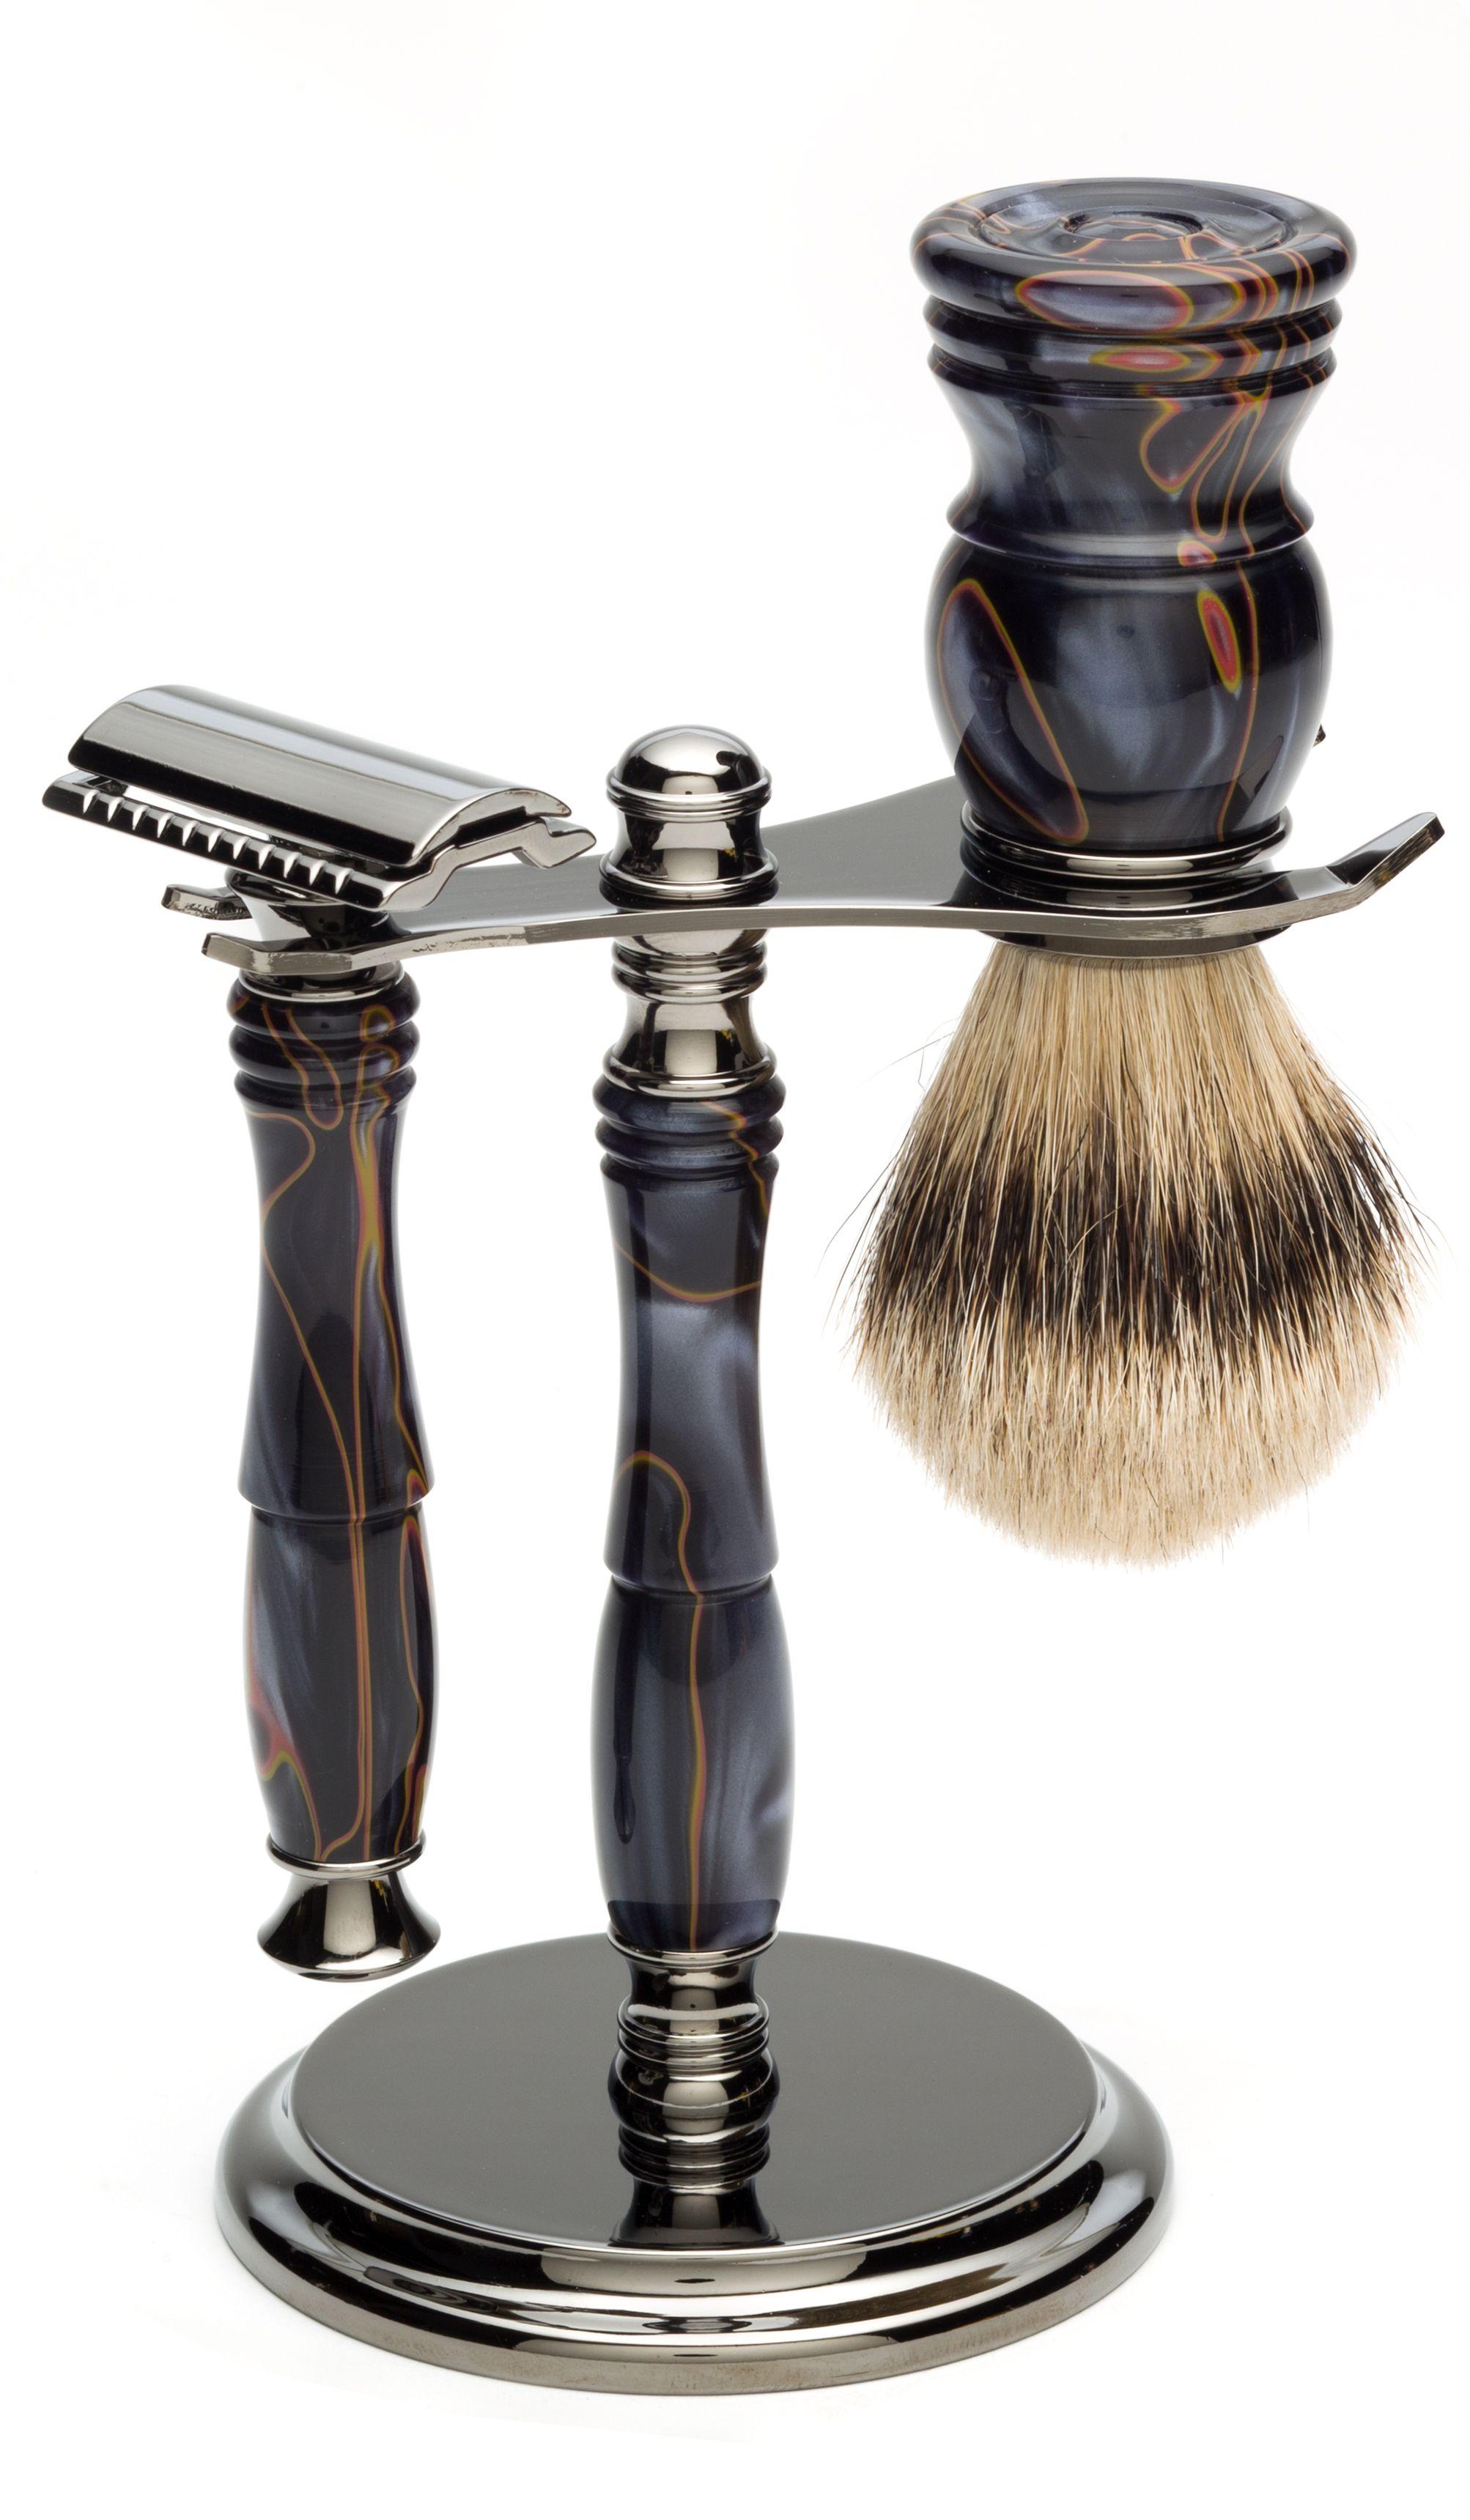 Turn a shaving kit today! #woodturning #shaving